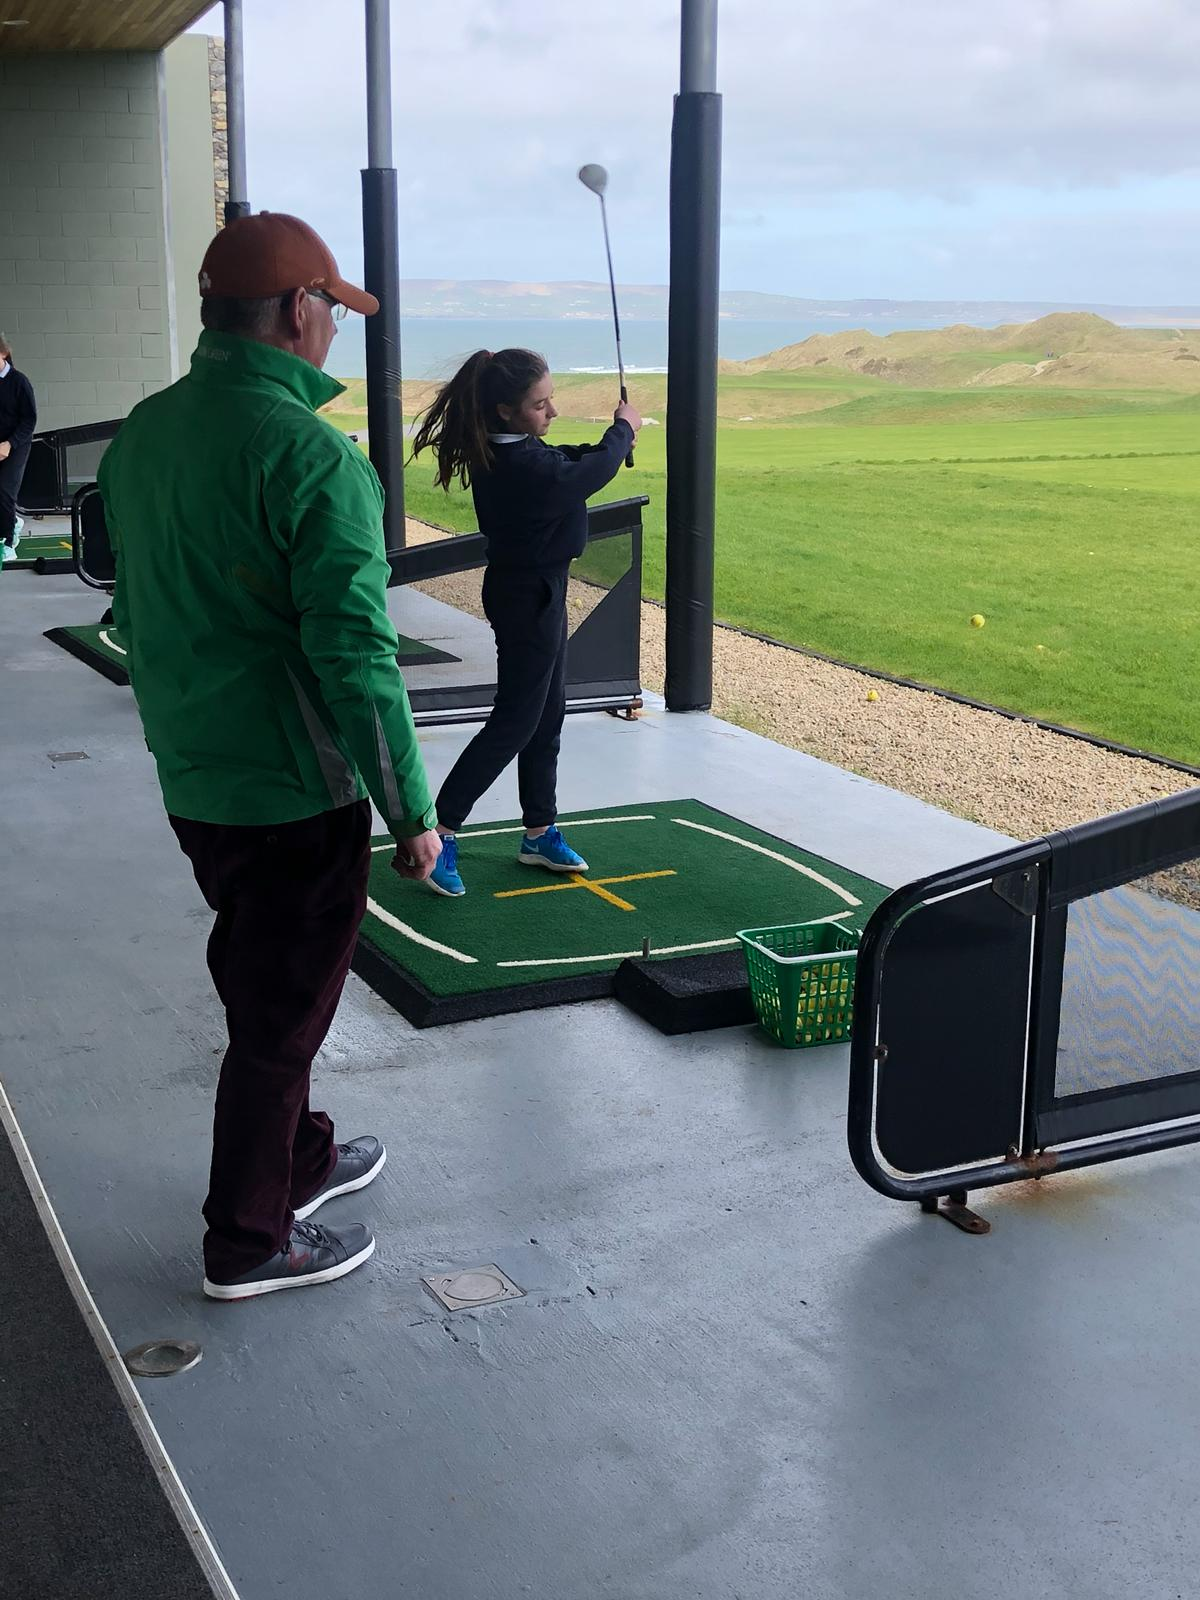 Golfing in Barrow.🏌️♀️